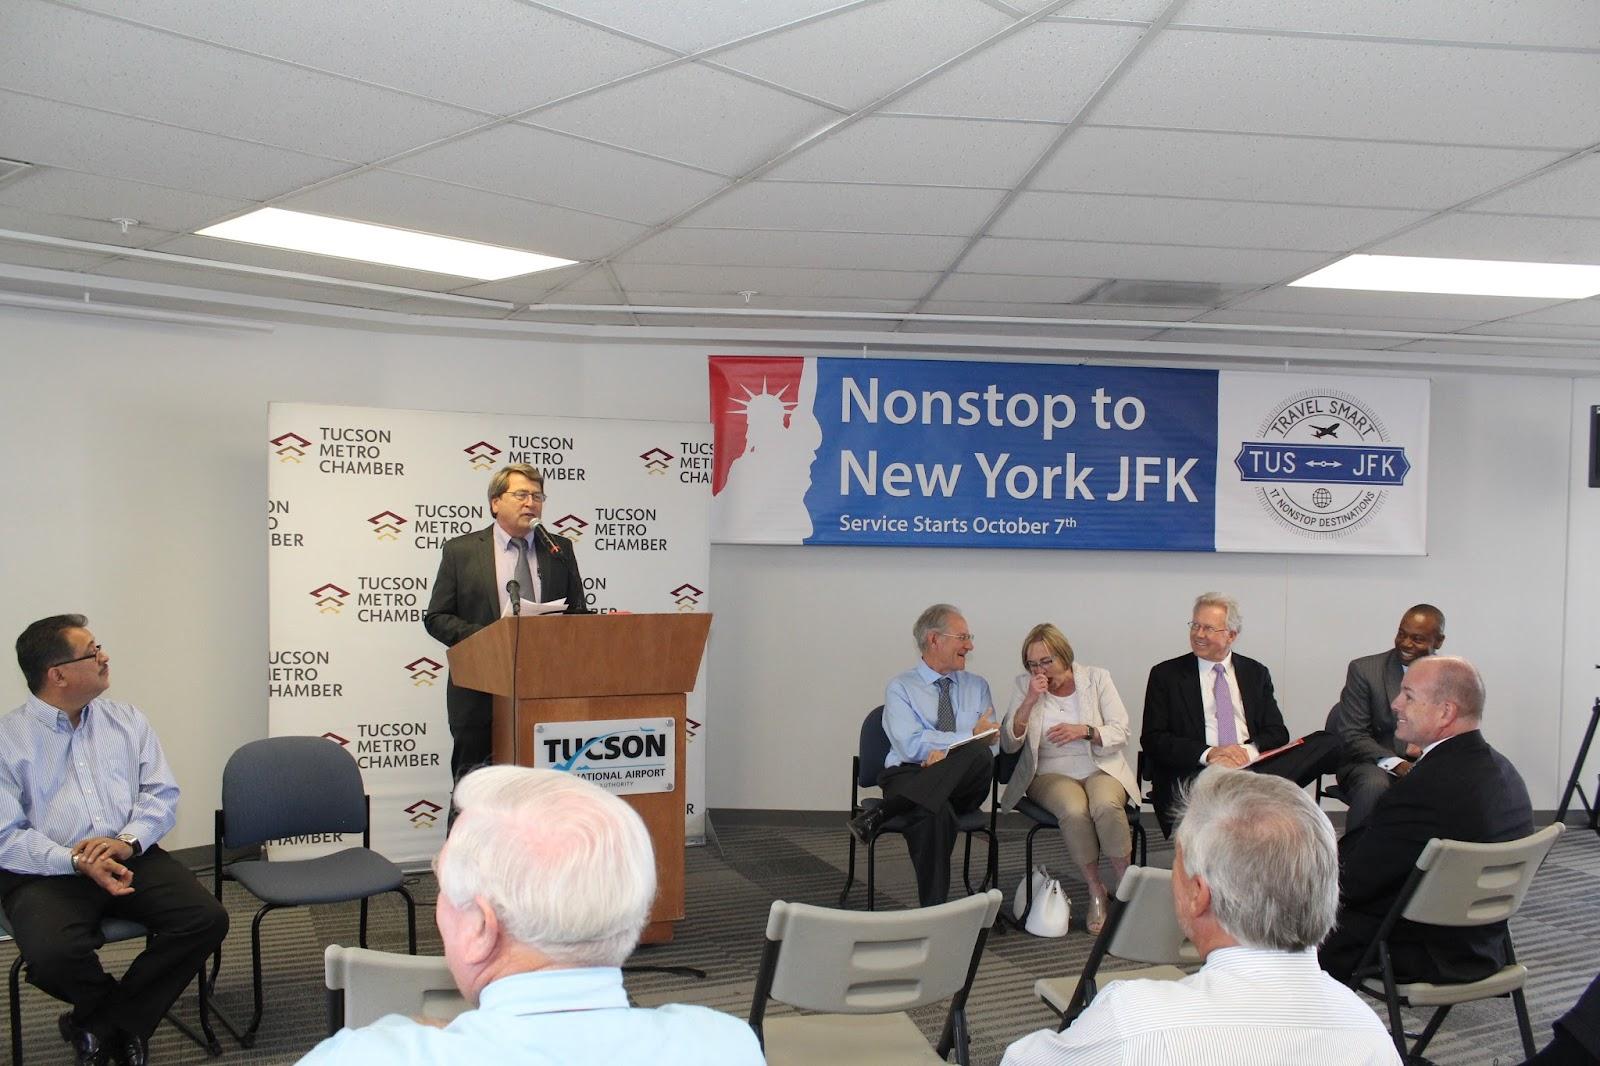 Tucson - JFK Non-Stop Route Announcement - IMG_3171.JPG